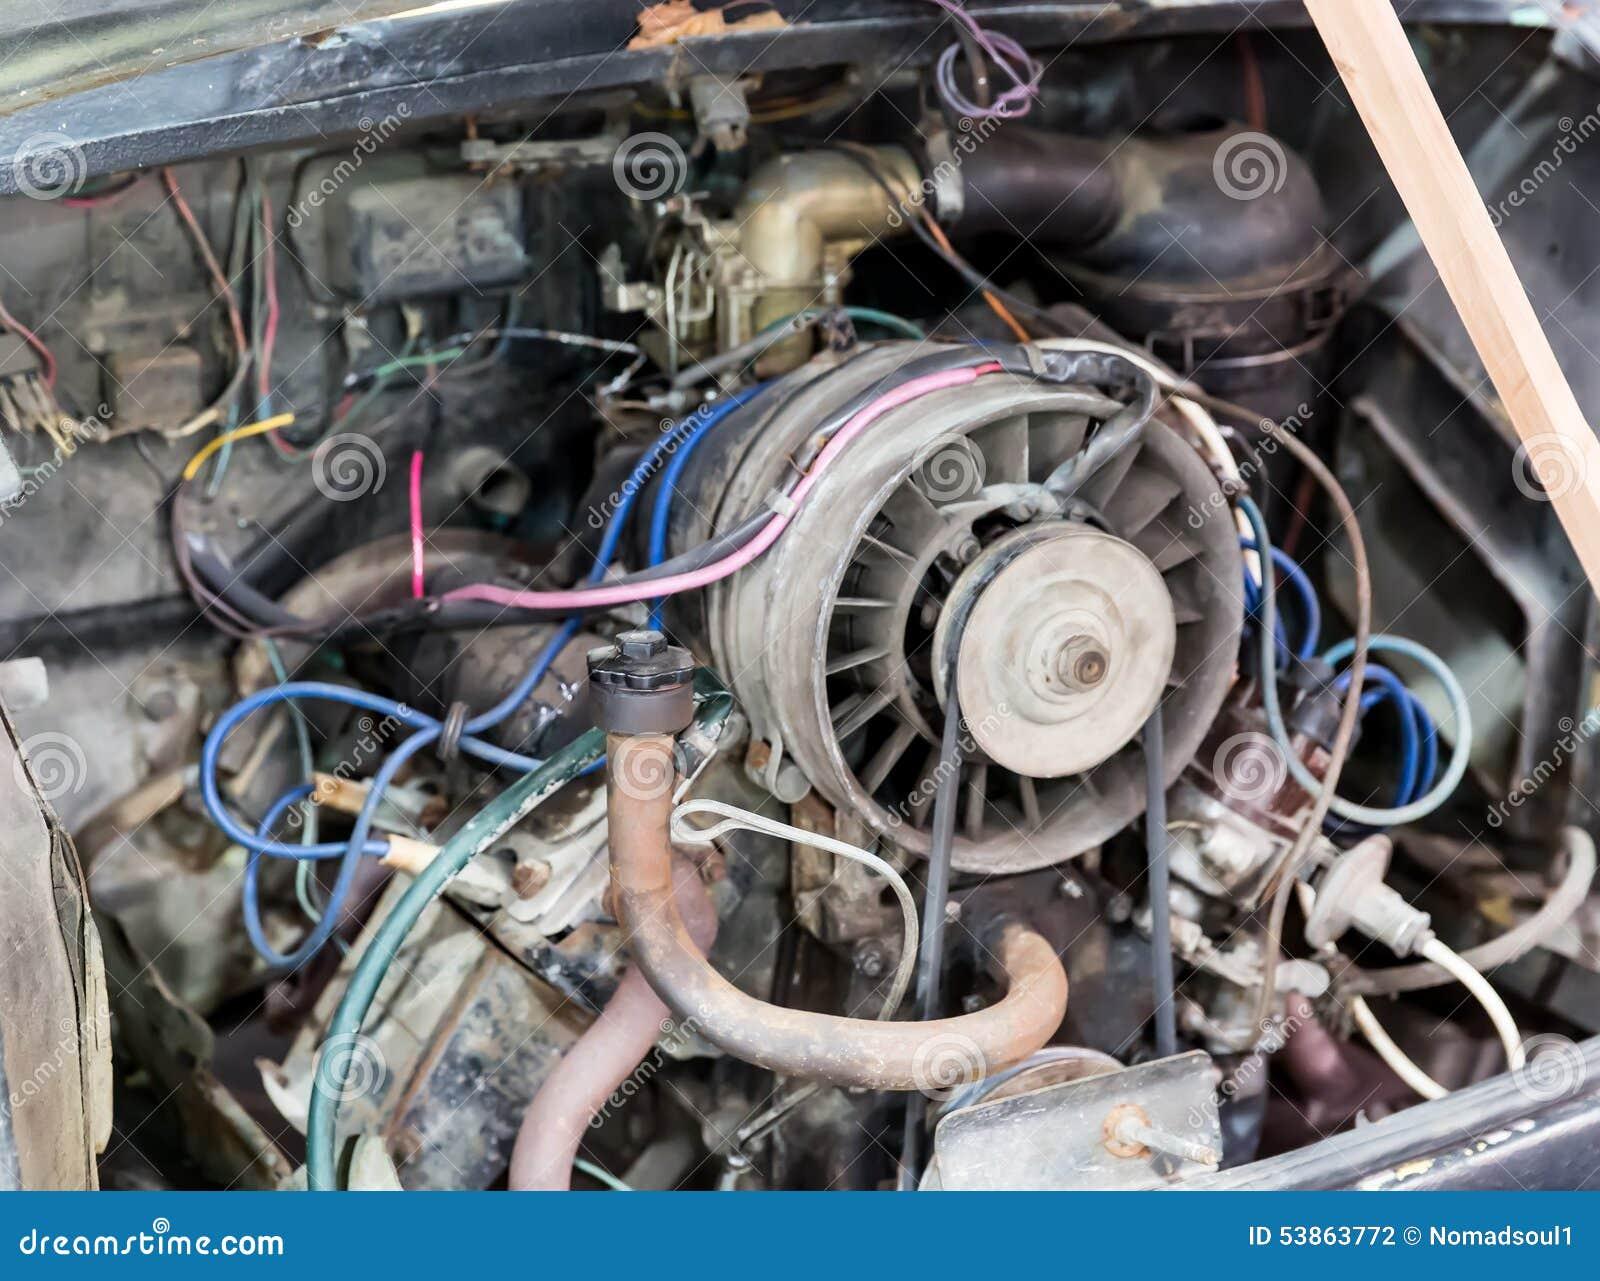 Old car engine stock photo. Image of metal, clean, dark - 53863772